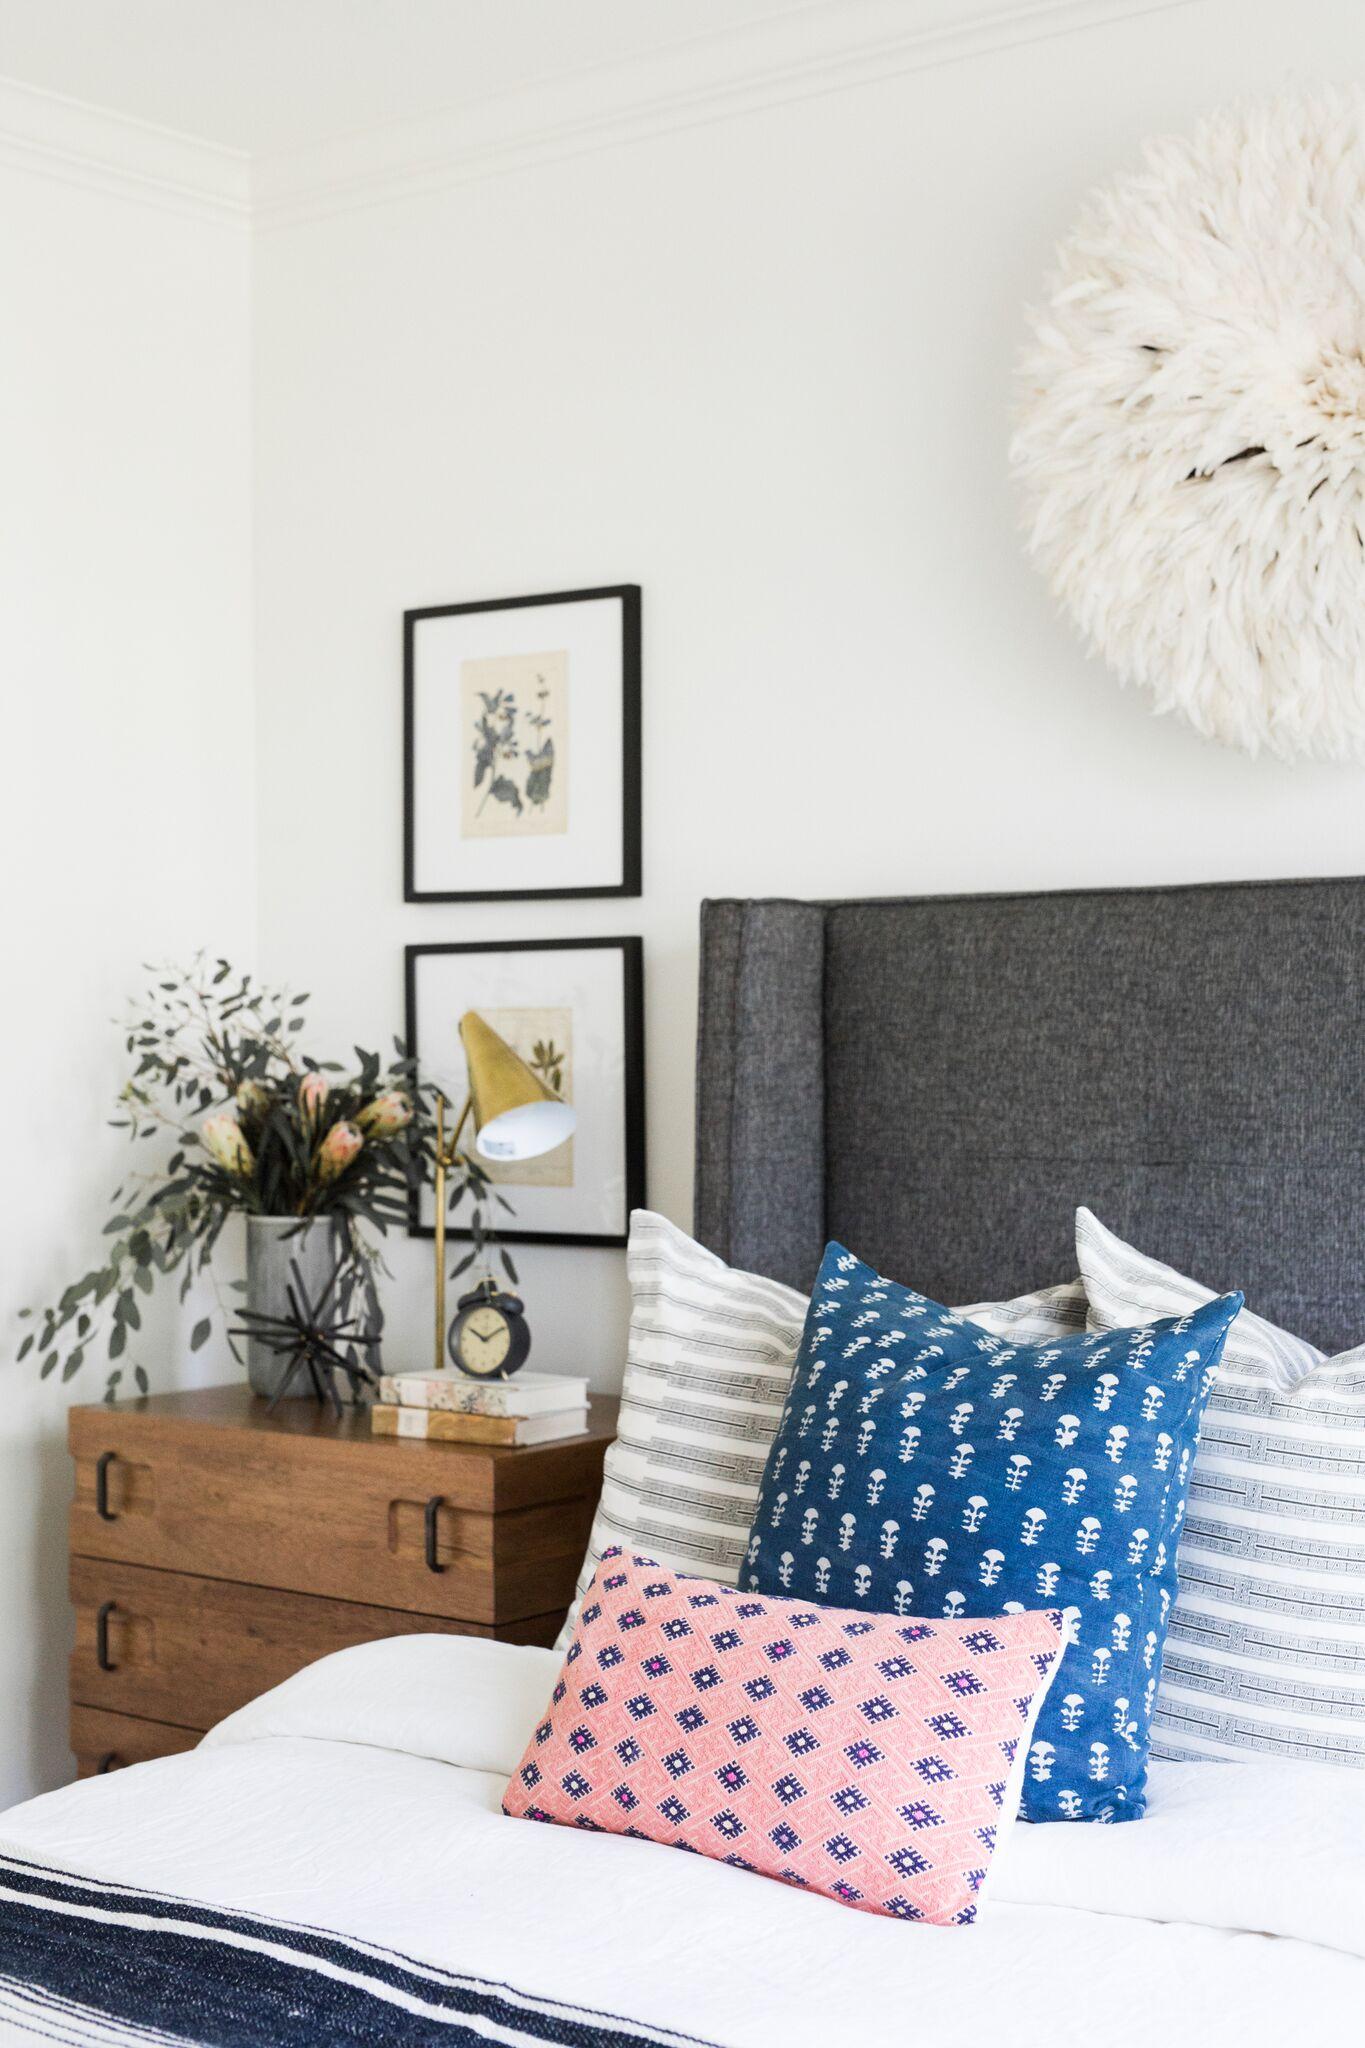 Coastal+Bohemian+Guest+Bedroom+with+Vintage+Rug+and+Botanical+Prints.jpg